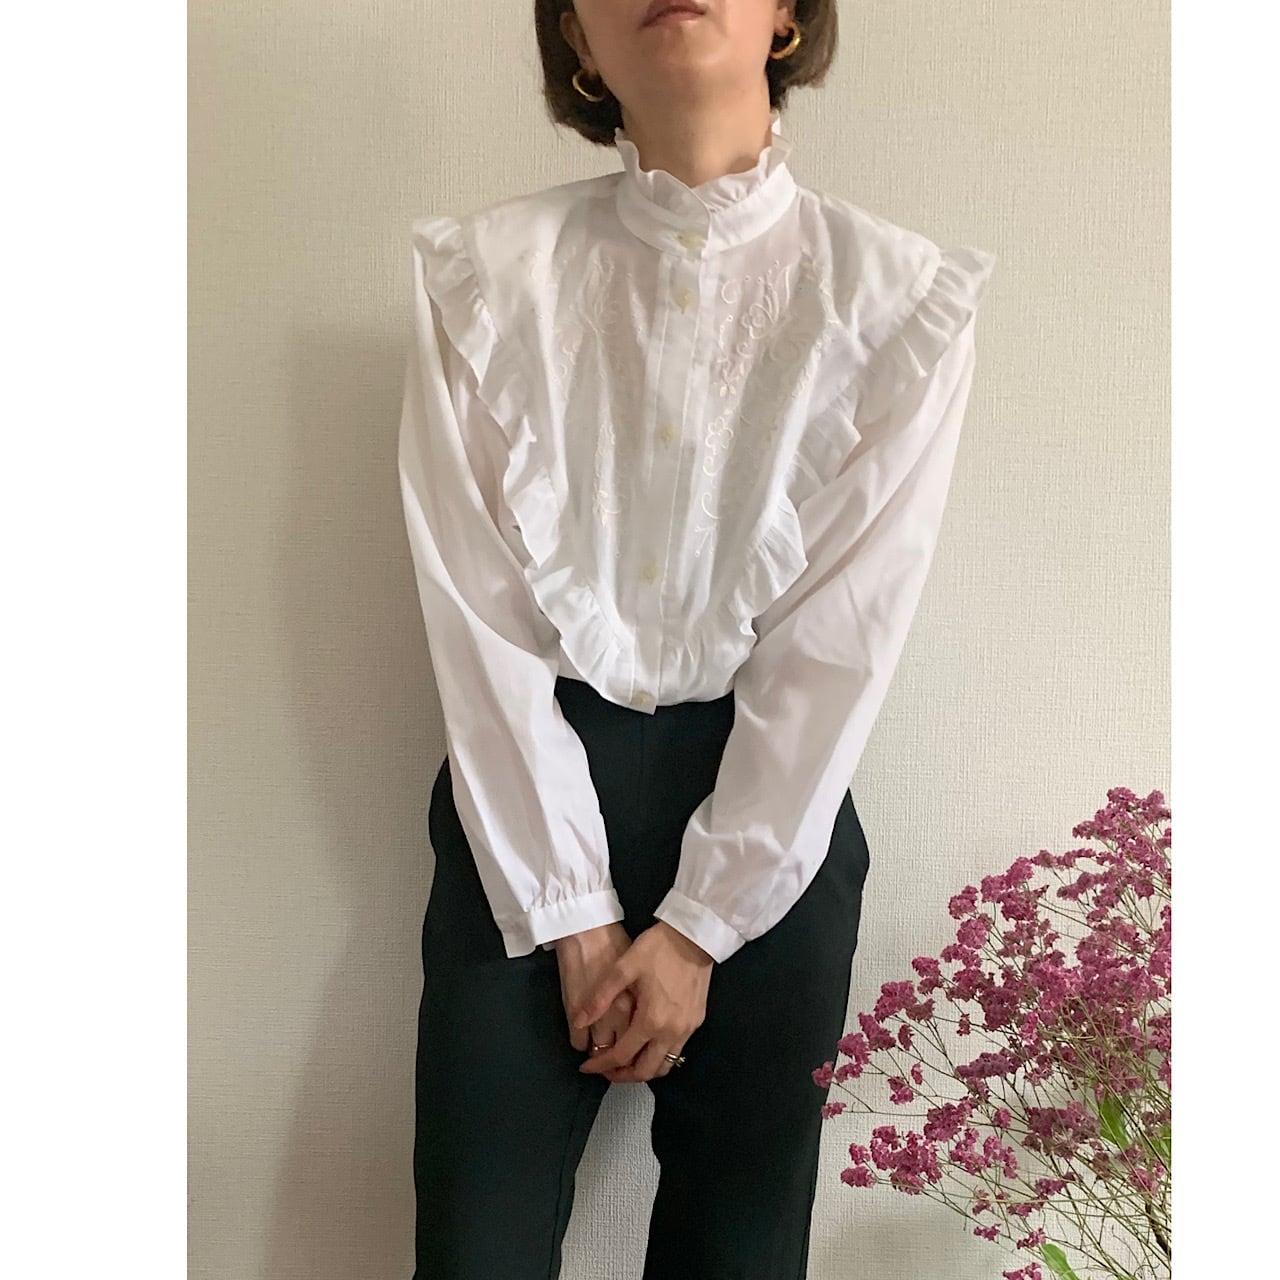 80's Vintage White Austrian Puffy sleeve Blouse